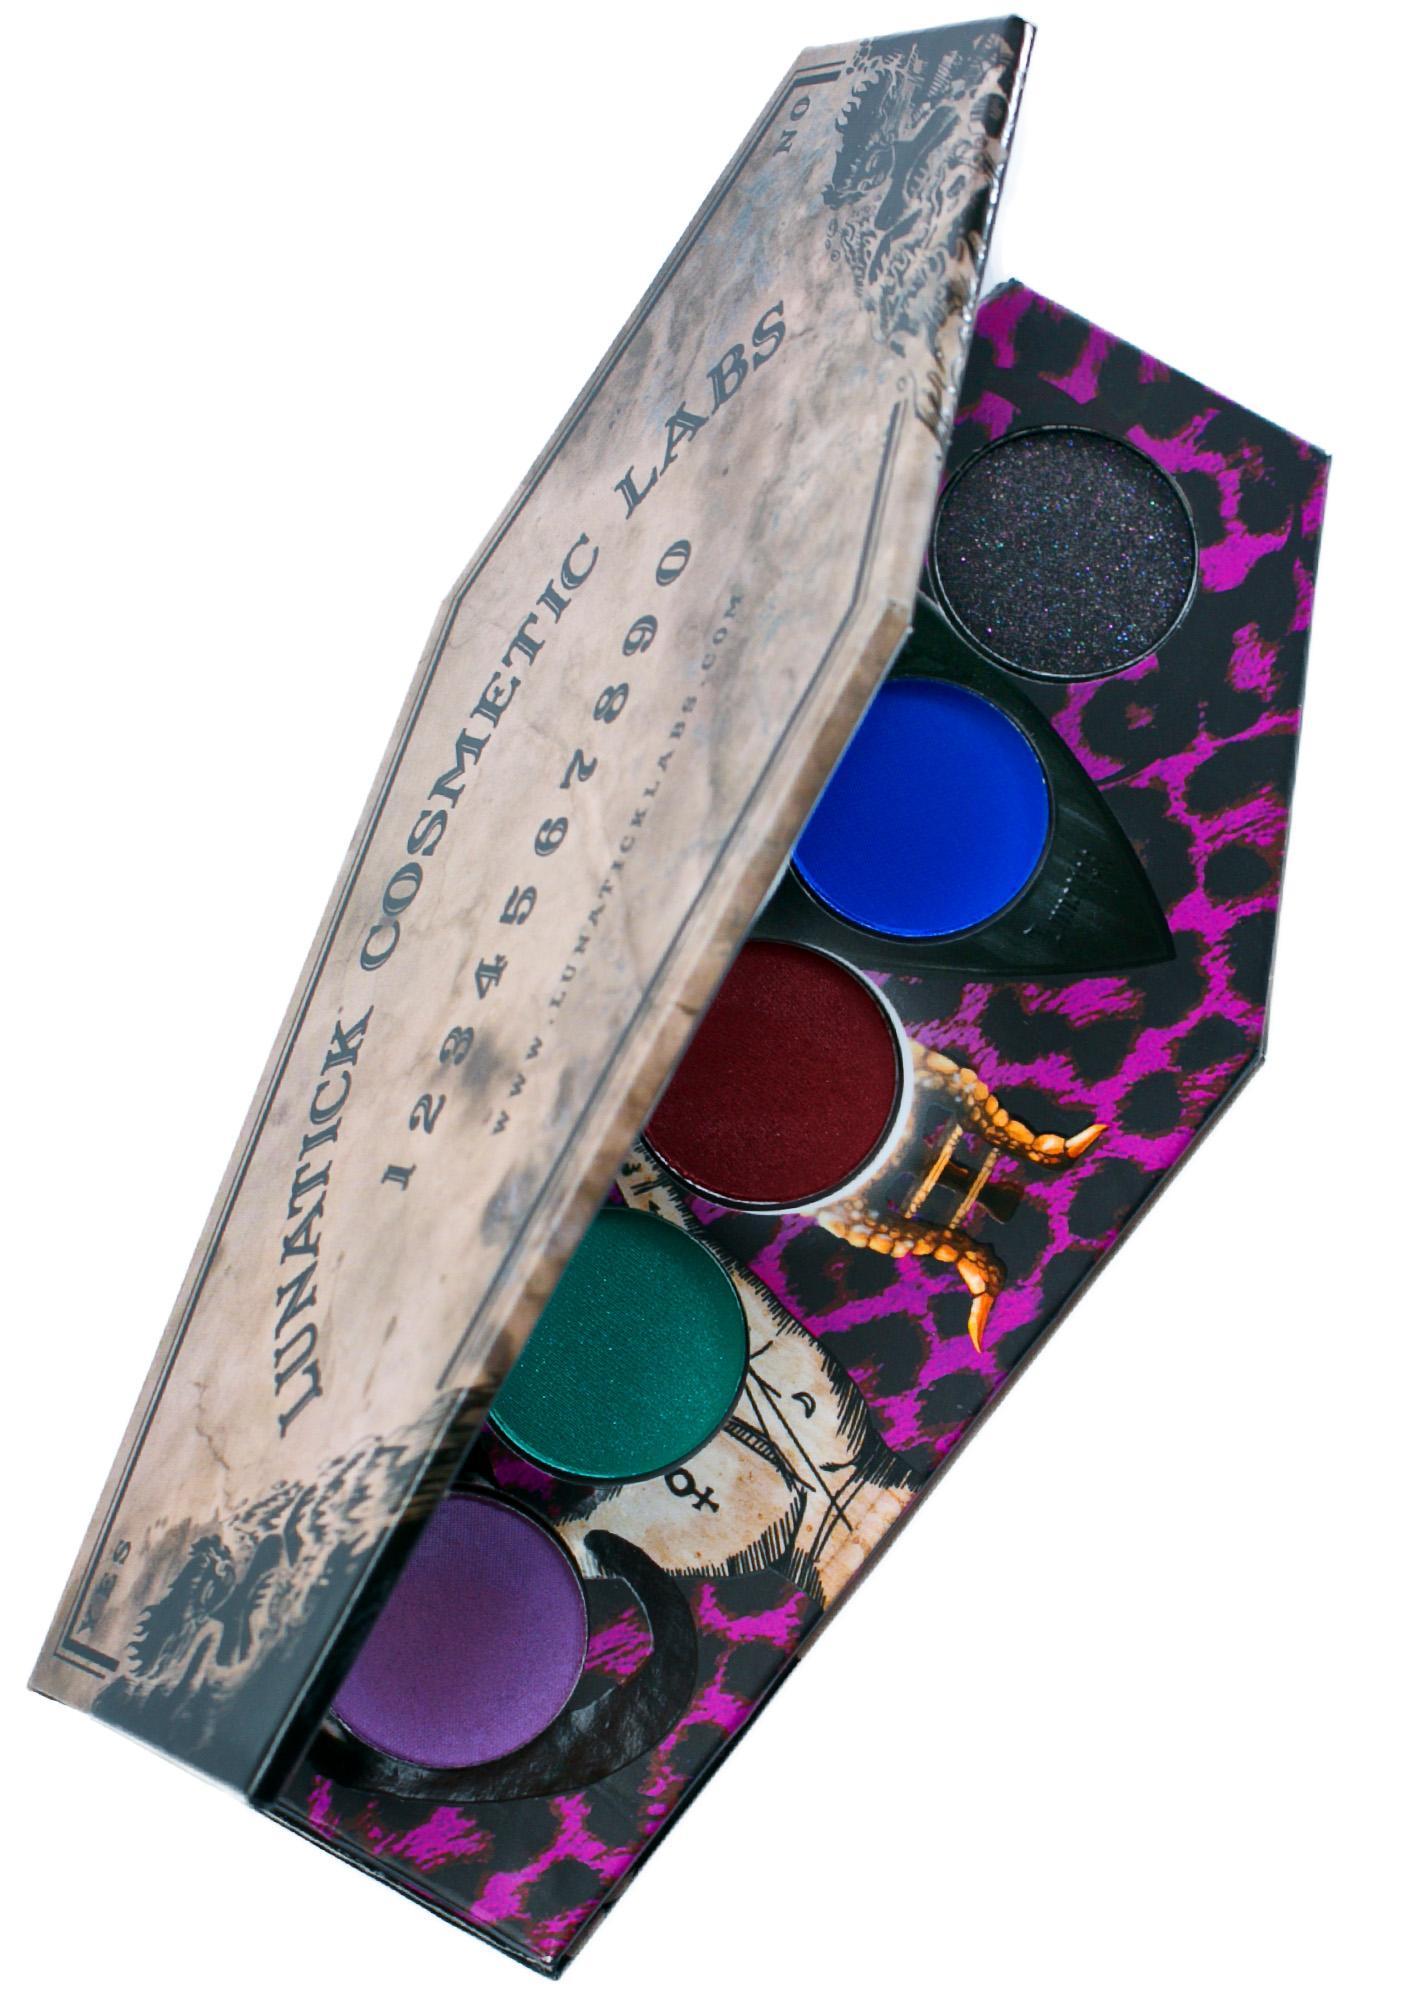 Lunatick Cosmetic Labs Zombie Defense Eye Shadow Palette